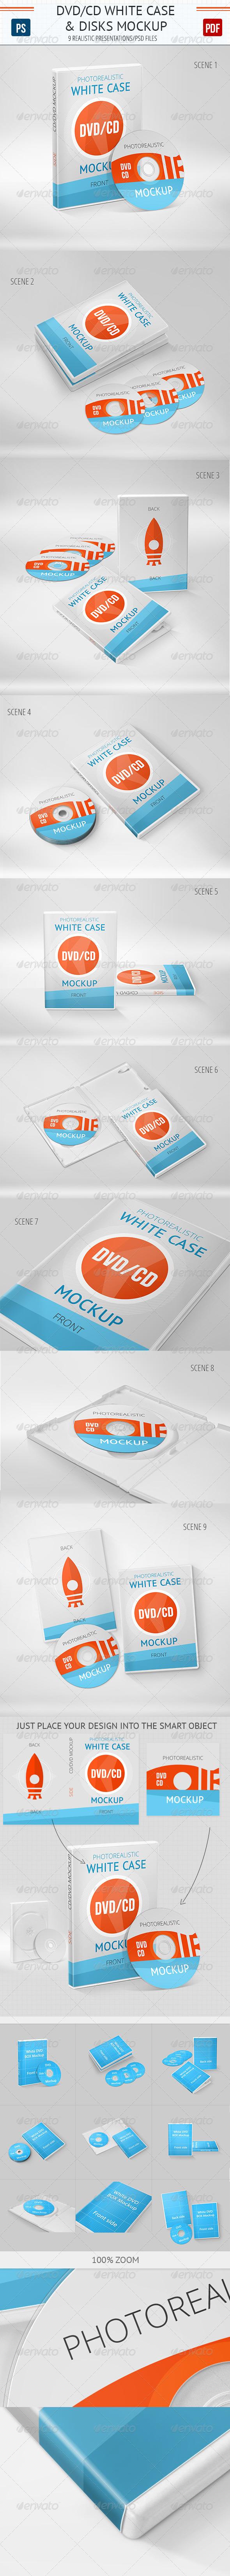 GraphicRiver Realistic DVD CD Mockup White Case & Disks 5591235